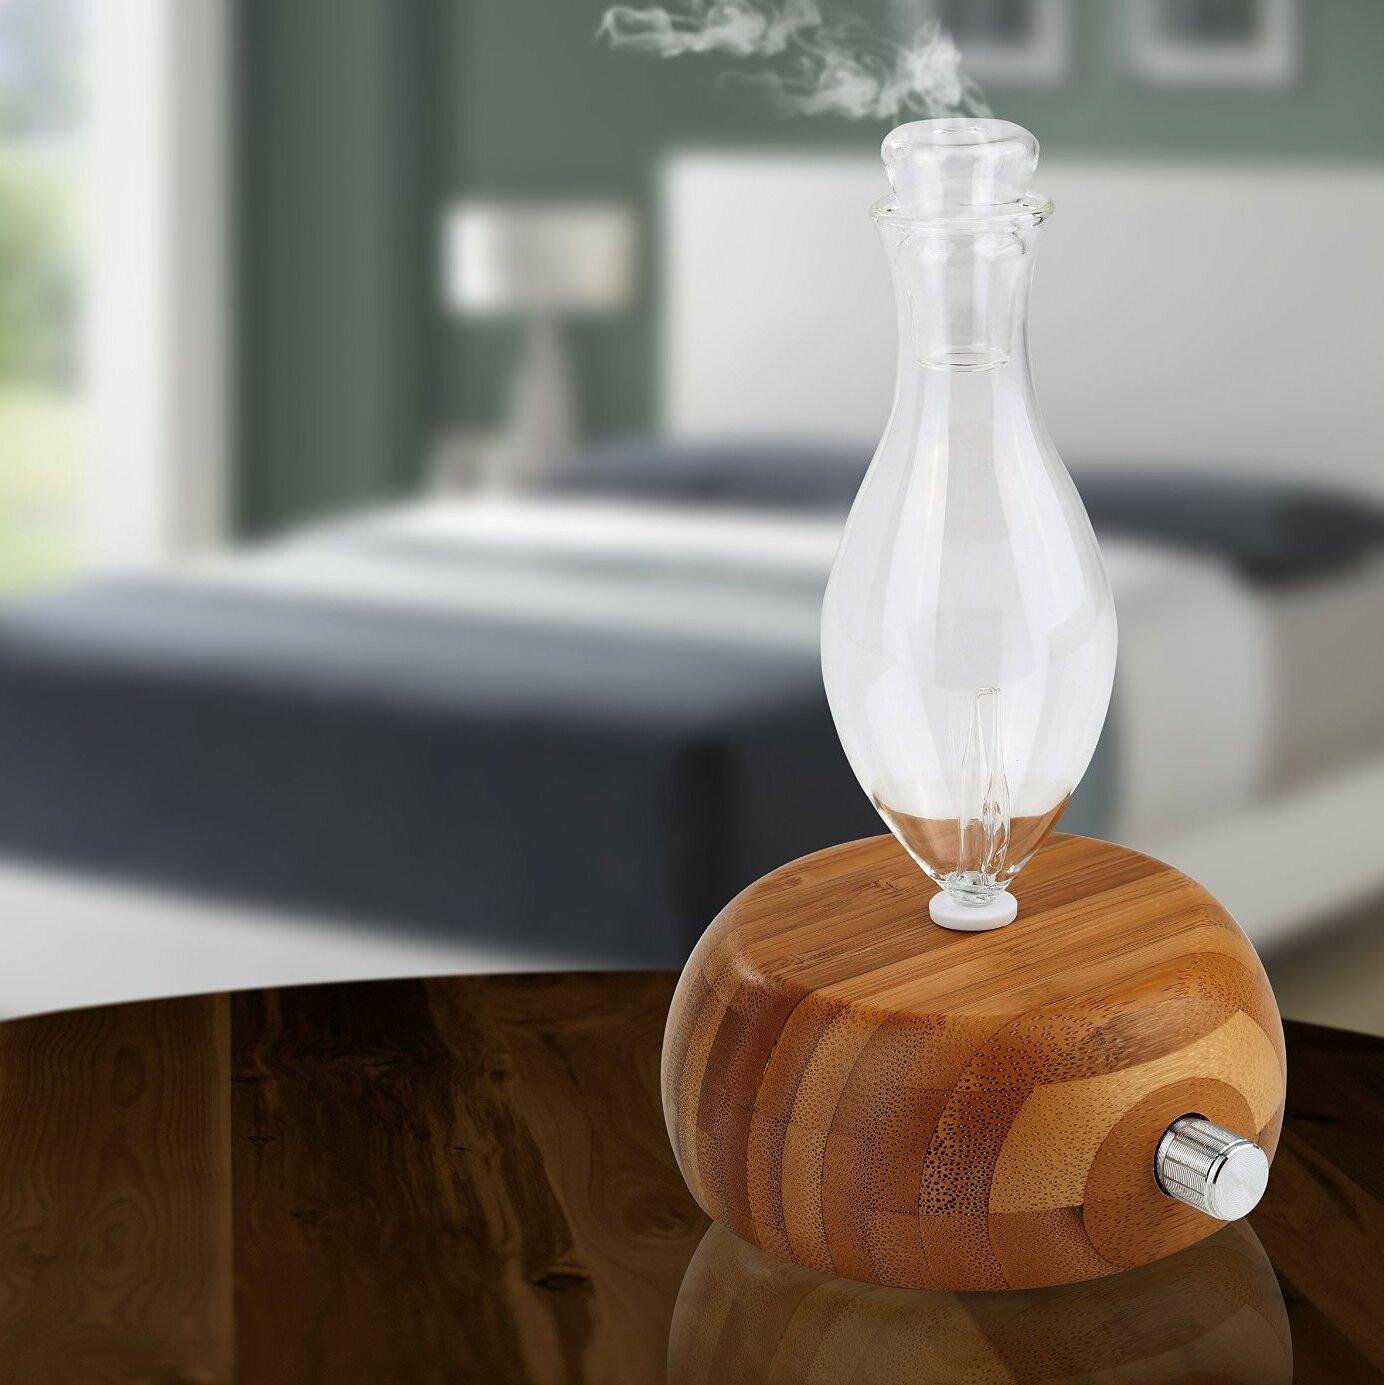 Welledia Pleasant Essential Oil Glass Nebulizing Diffuser